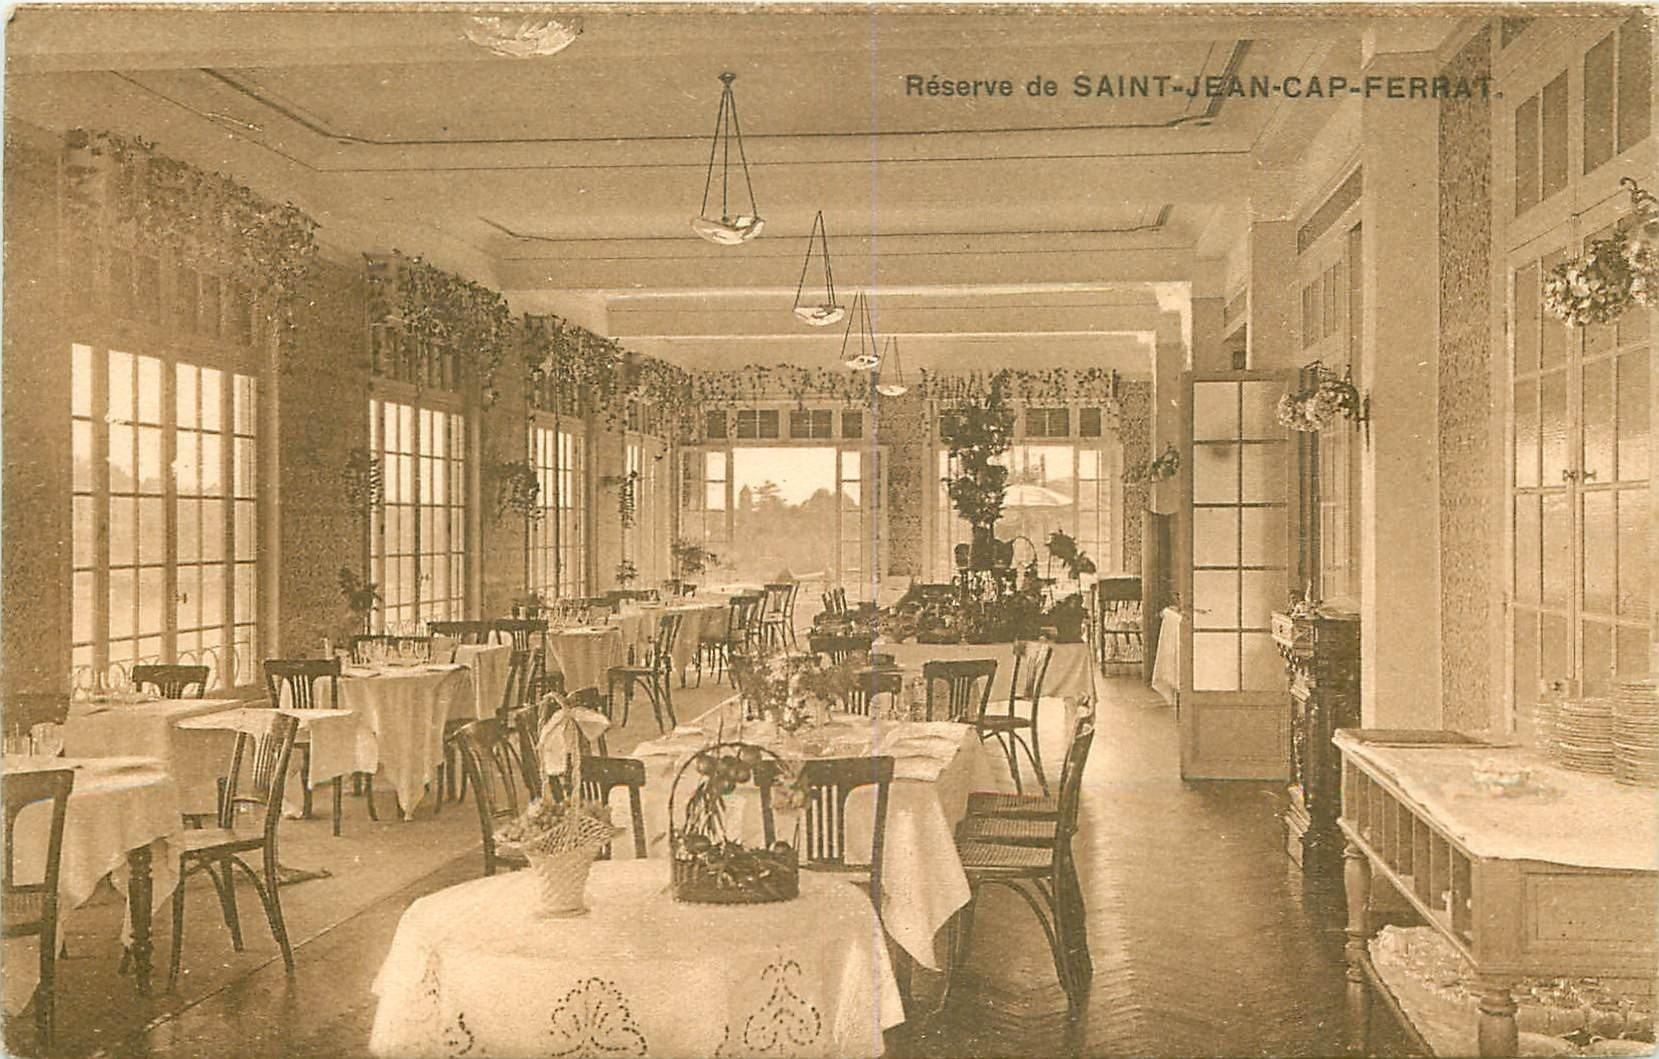 06 SAINT-JEAN-CAPE-FERRAT. La Réserve Namouna Restaurant